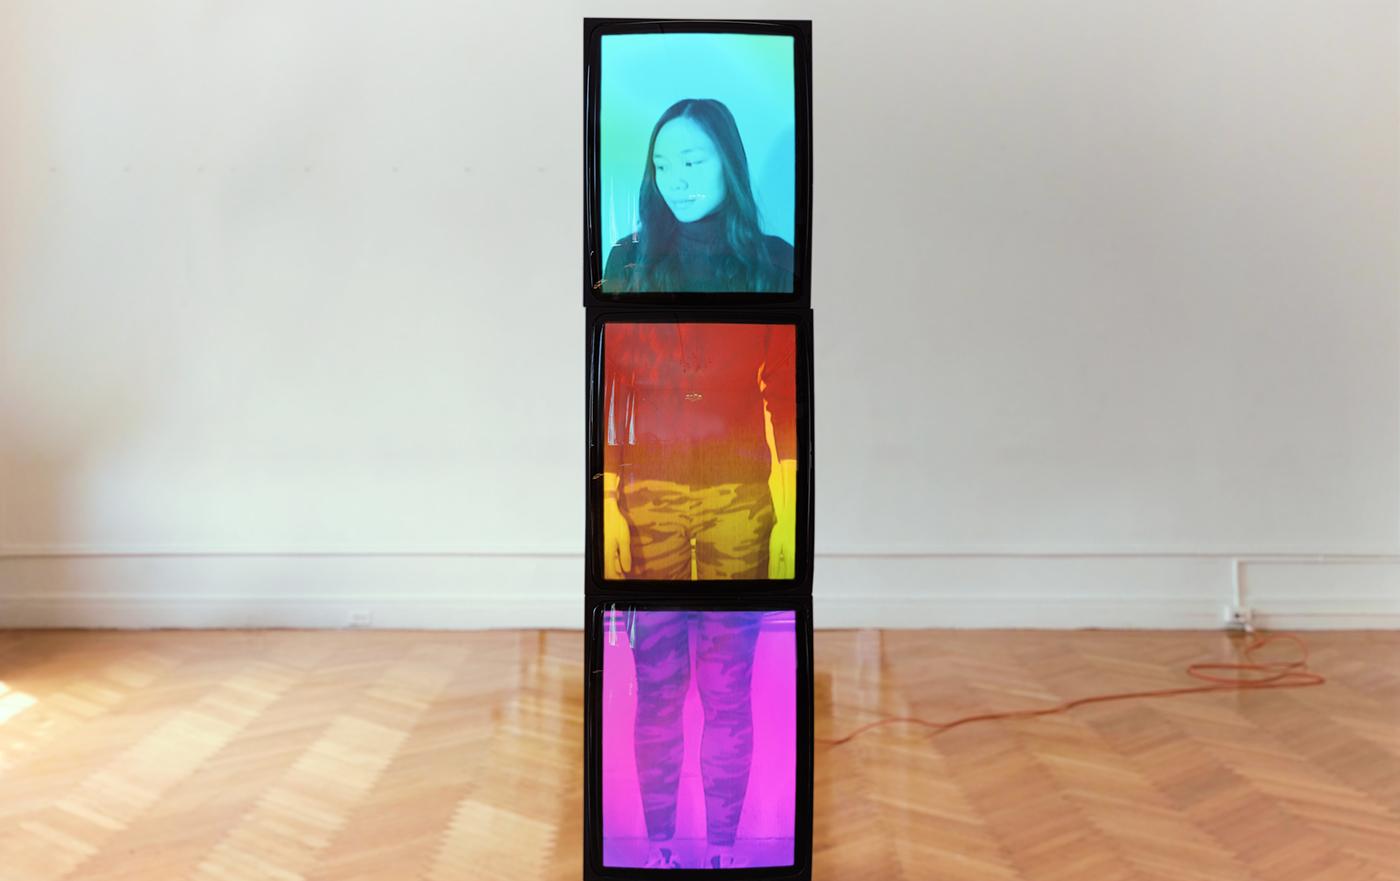 A video sculpture by Benton C Bainbridge portrays Allyssa Jill across 3 stacked CRT monitors in a gallery.